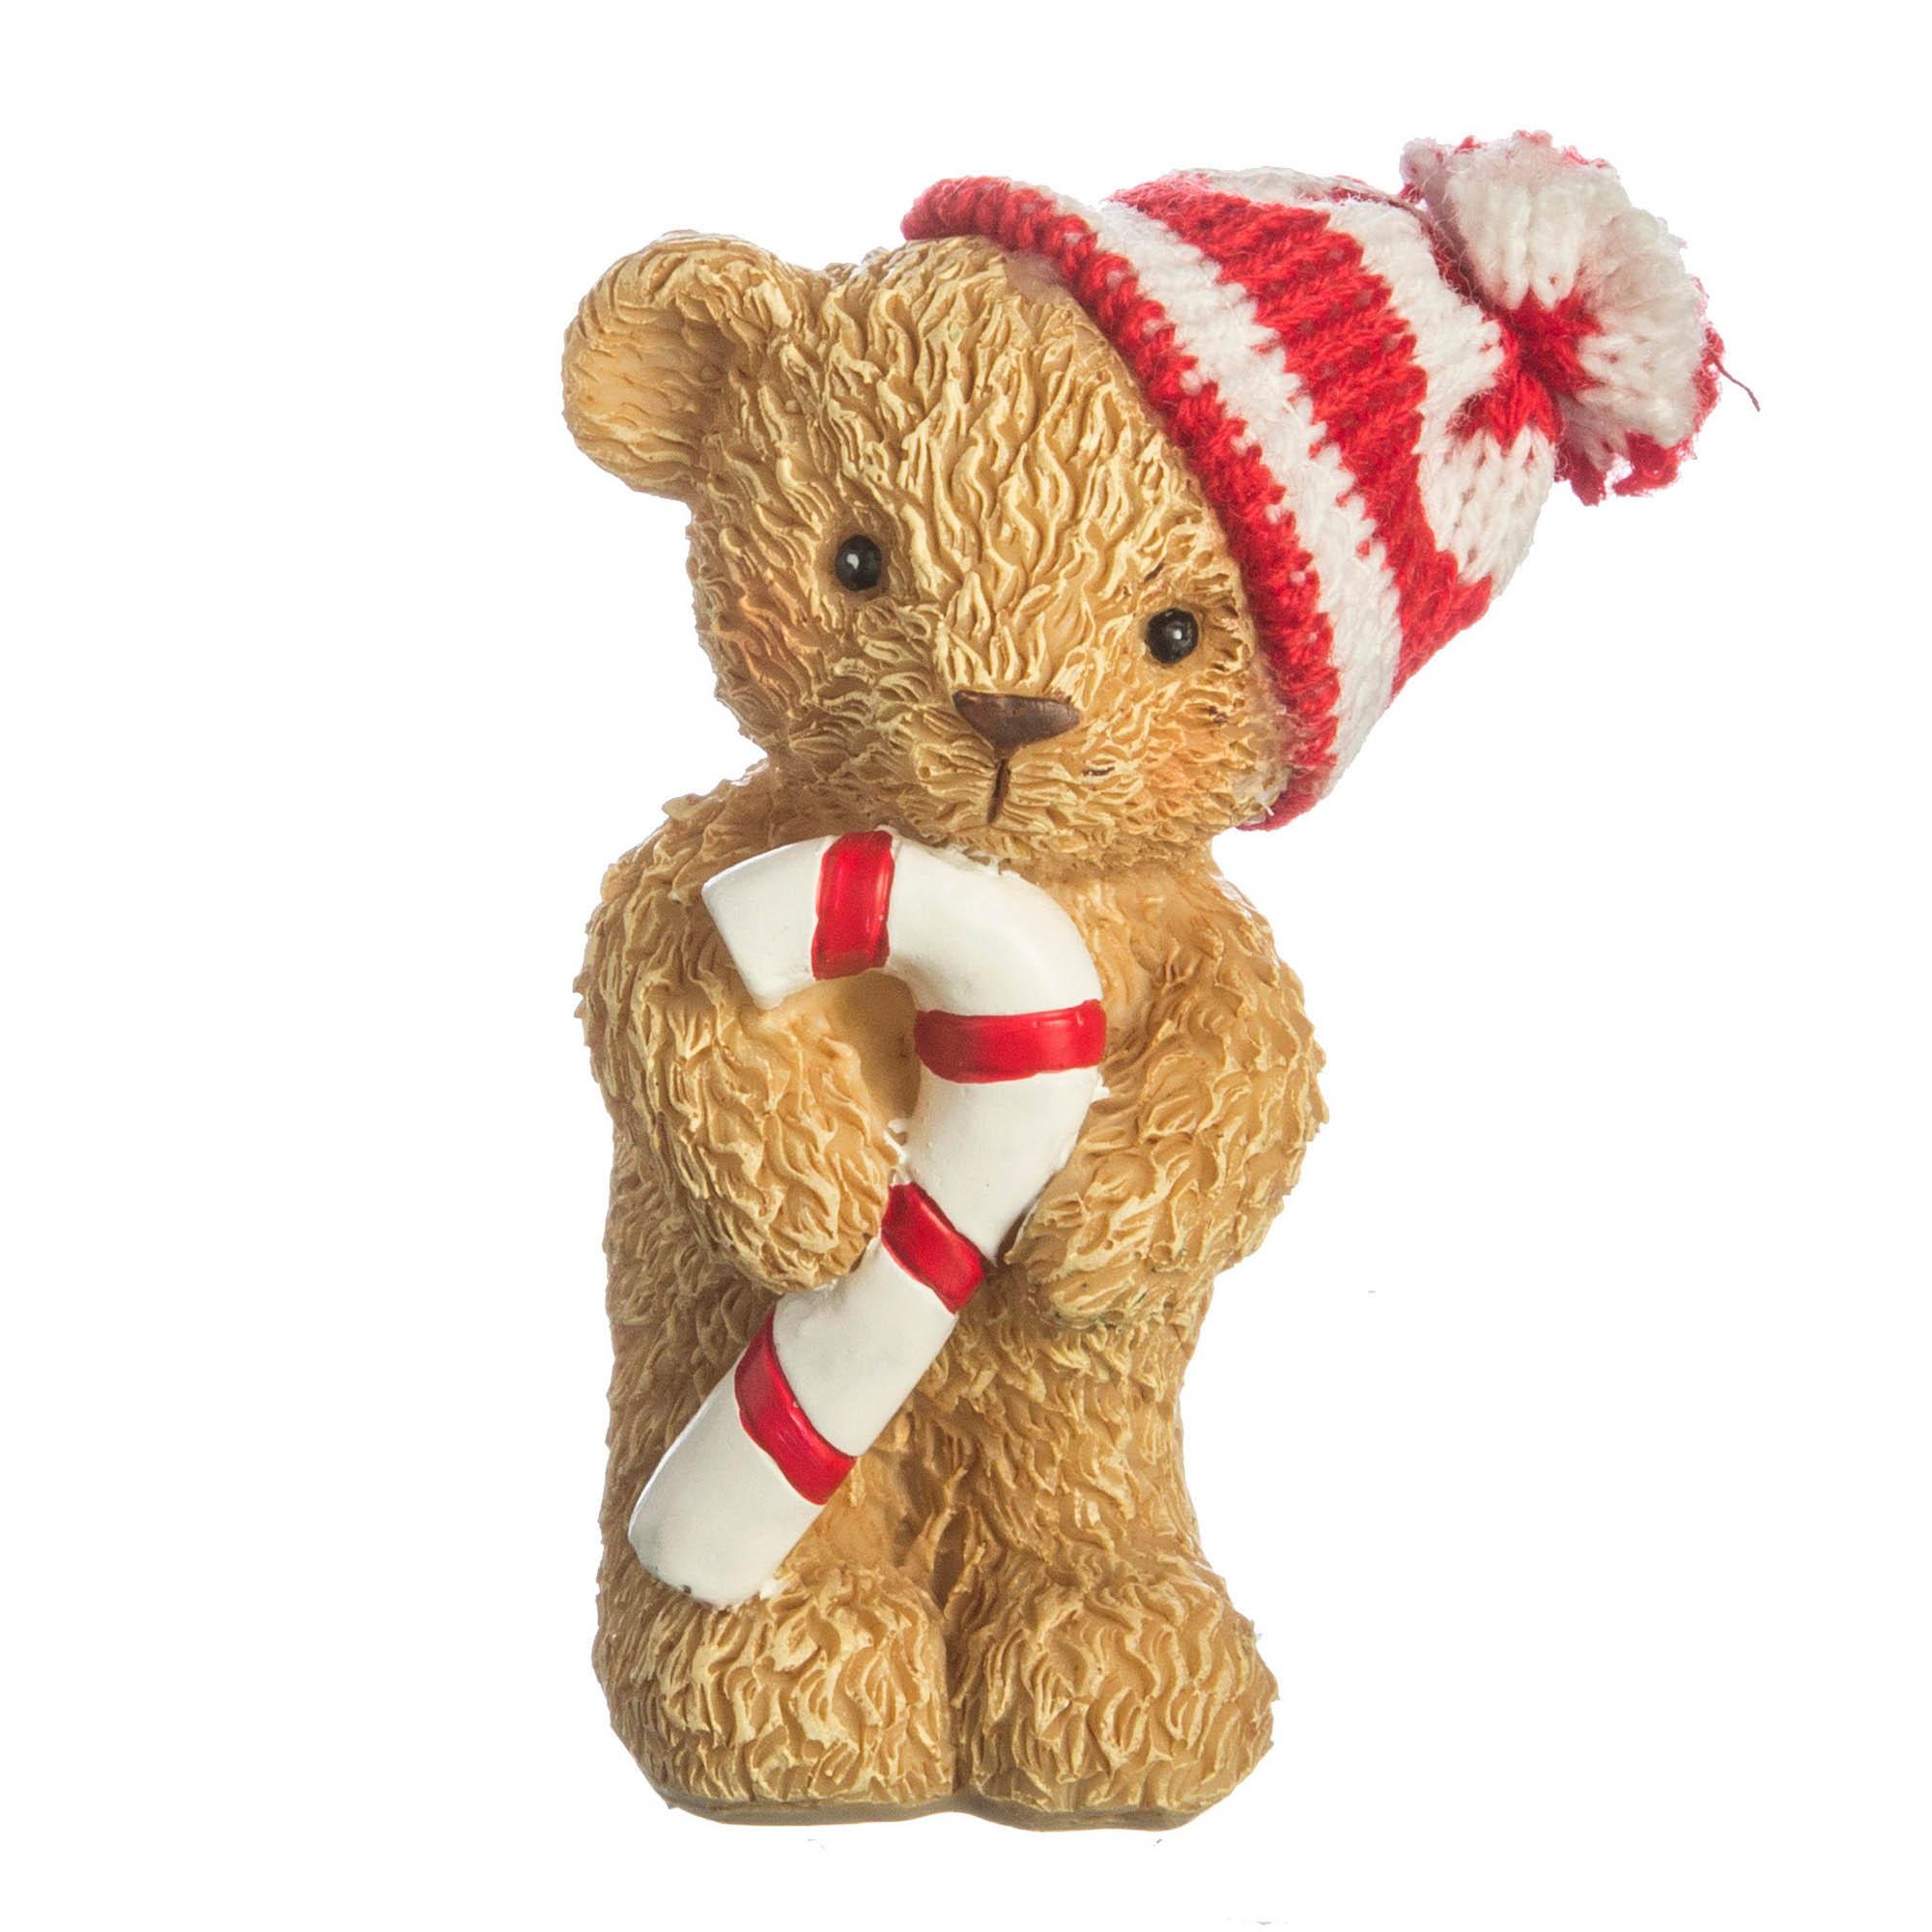 {} Lefard Интерьерная игрушка Медвежонок (4х5х7 см) lefard интерьерная игрушка jan 5х6х13 см